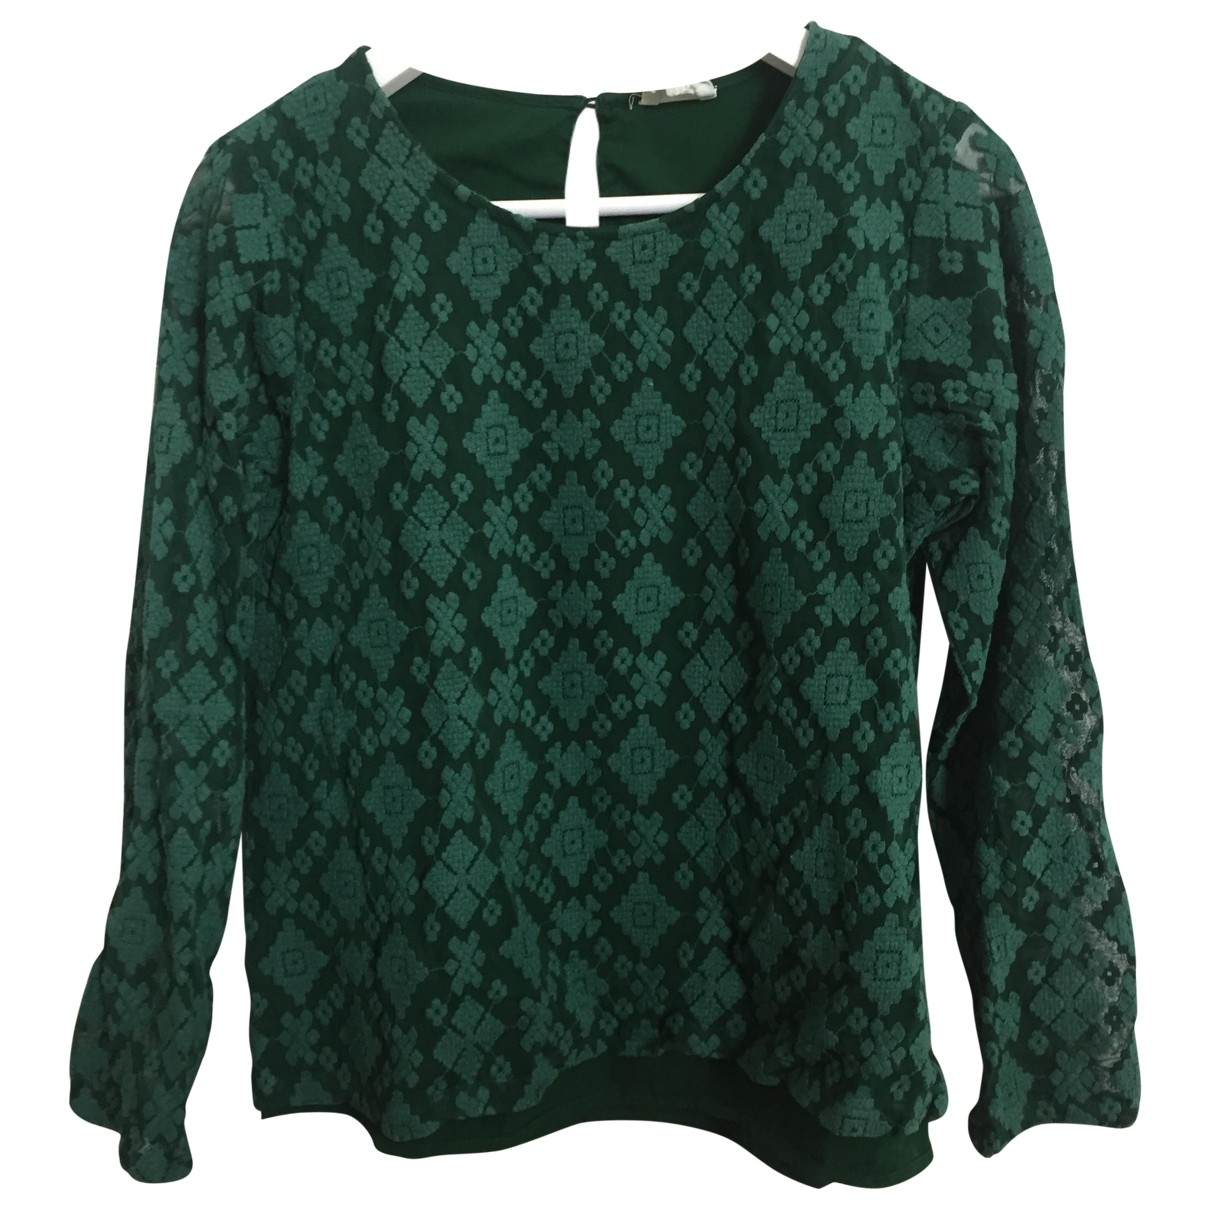 Sézane \N Green  top for Women S International